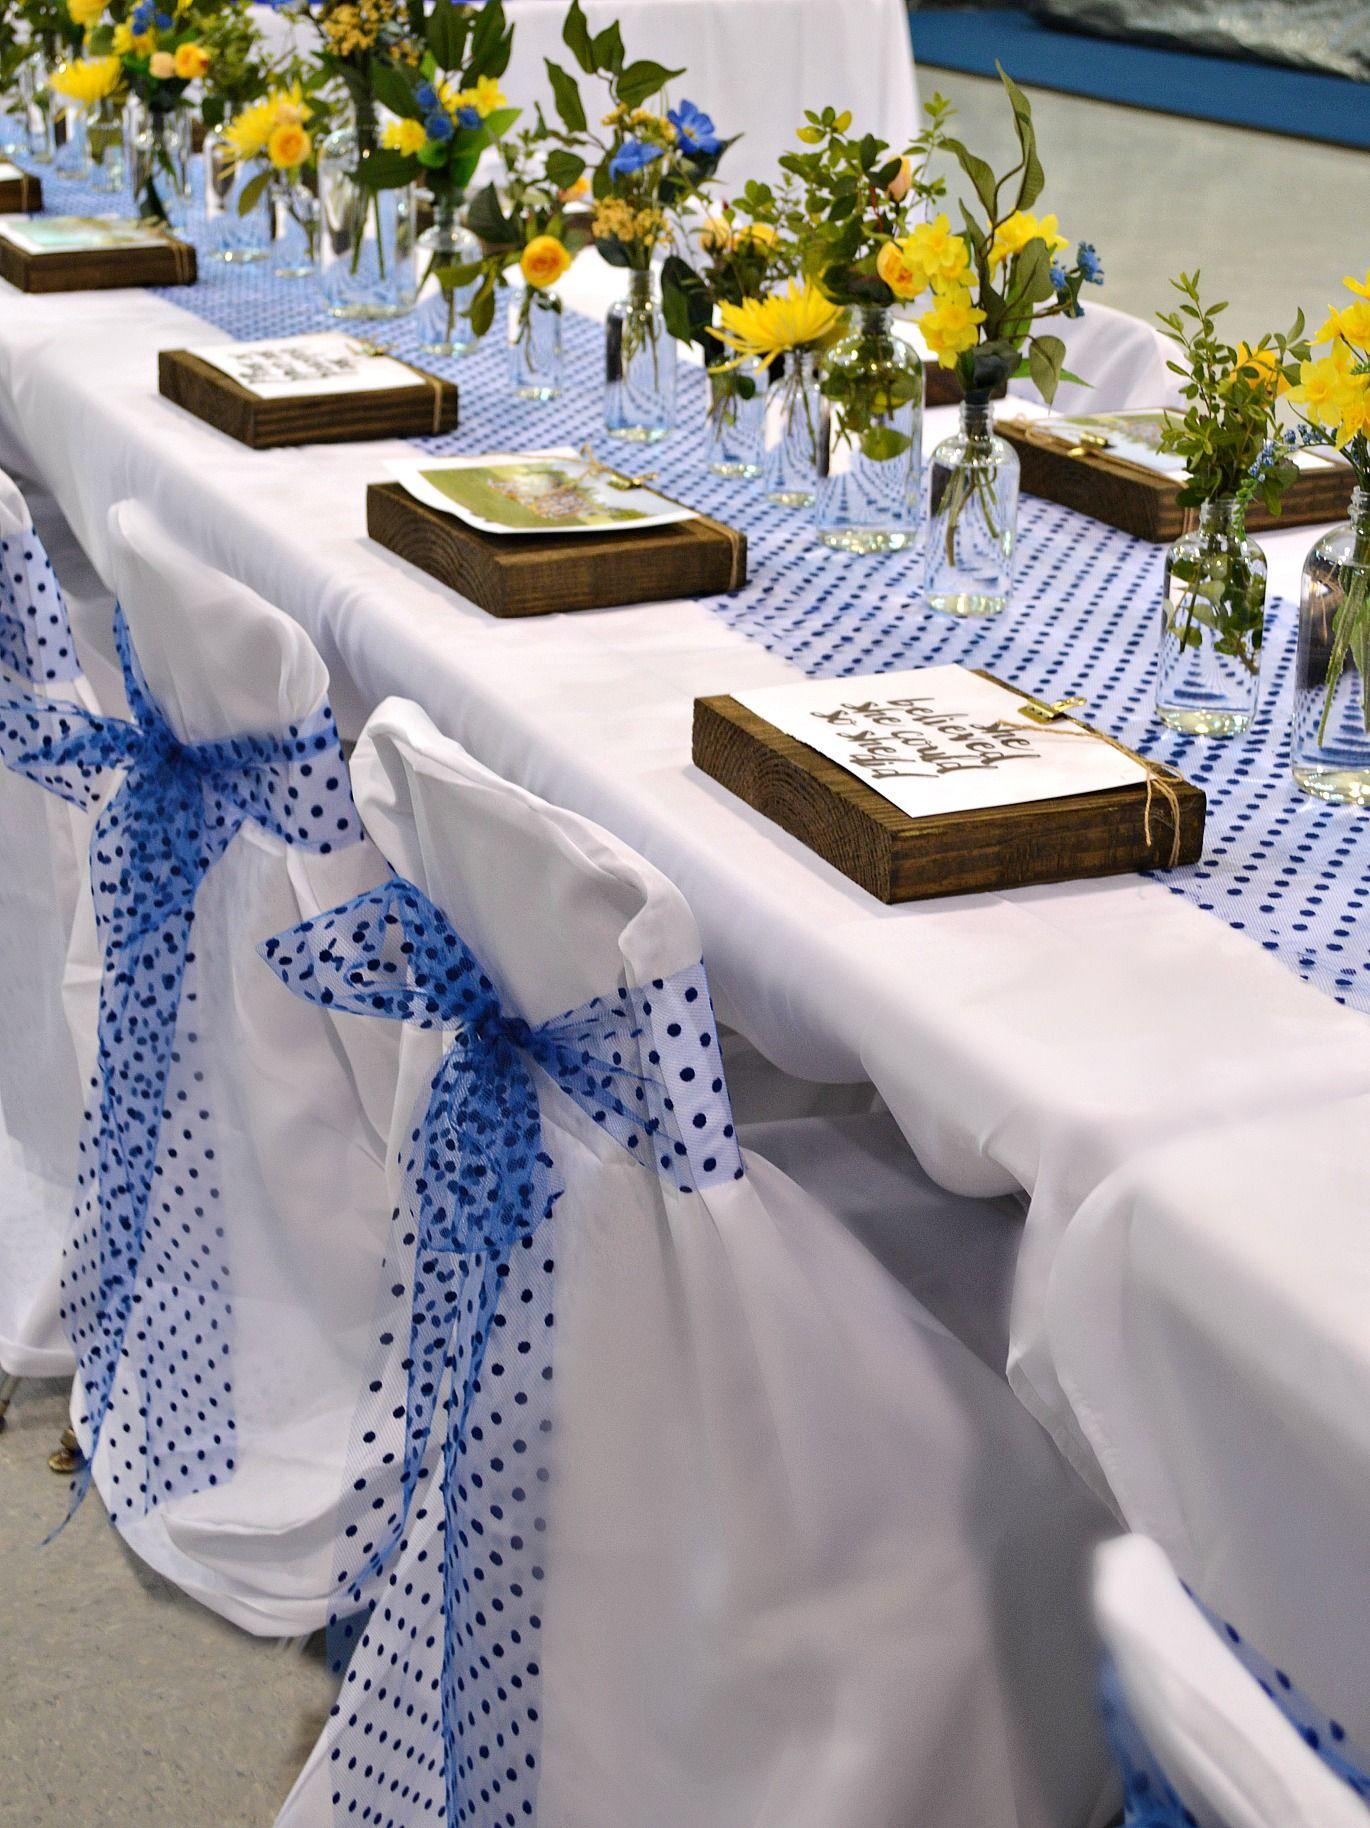 Chic Banquet Decorations On A Budget Banquet Decorations